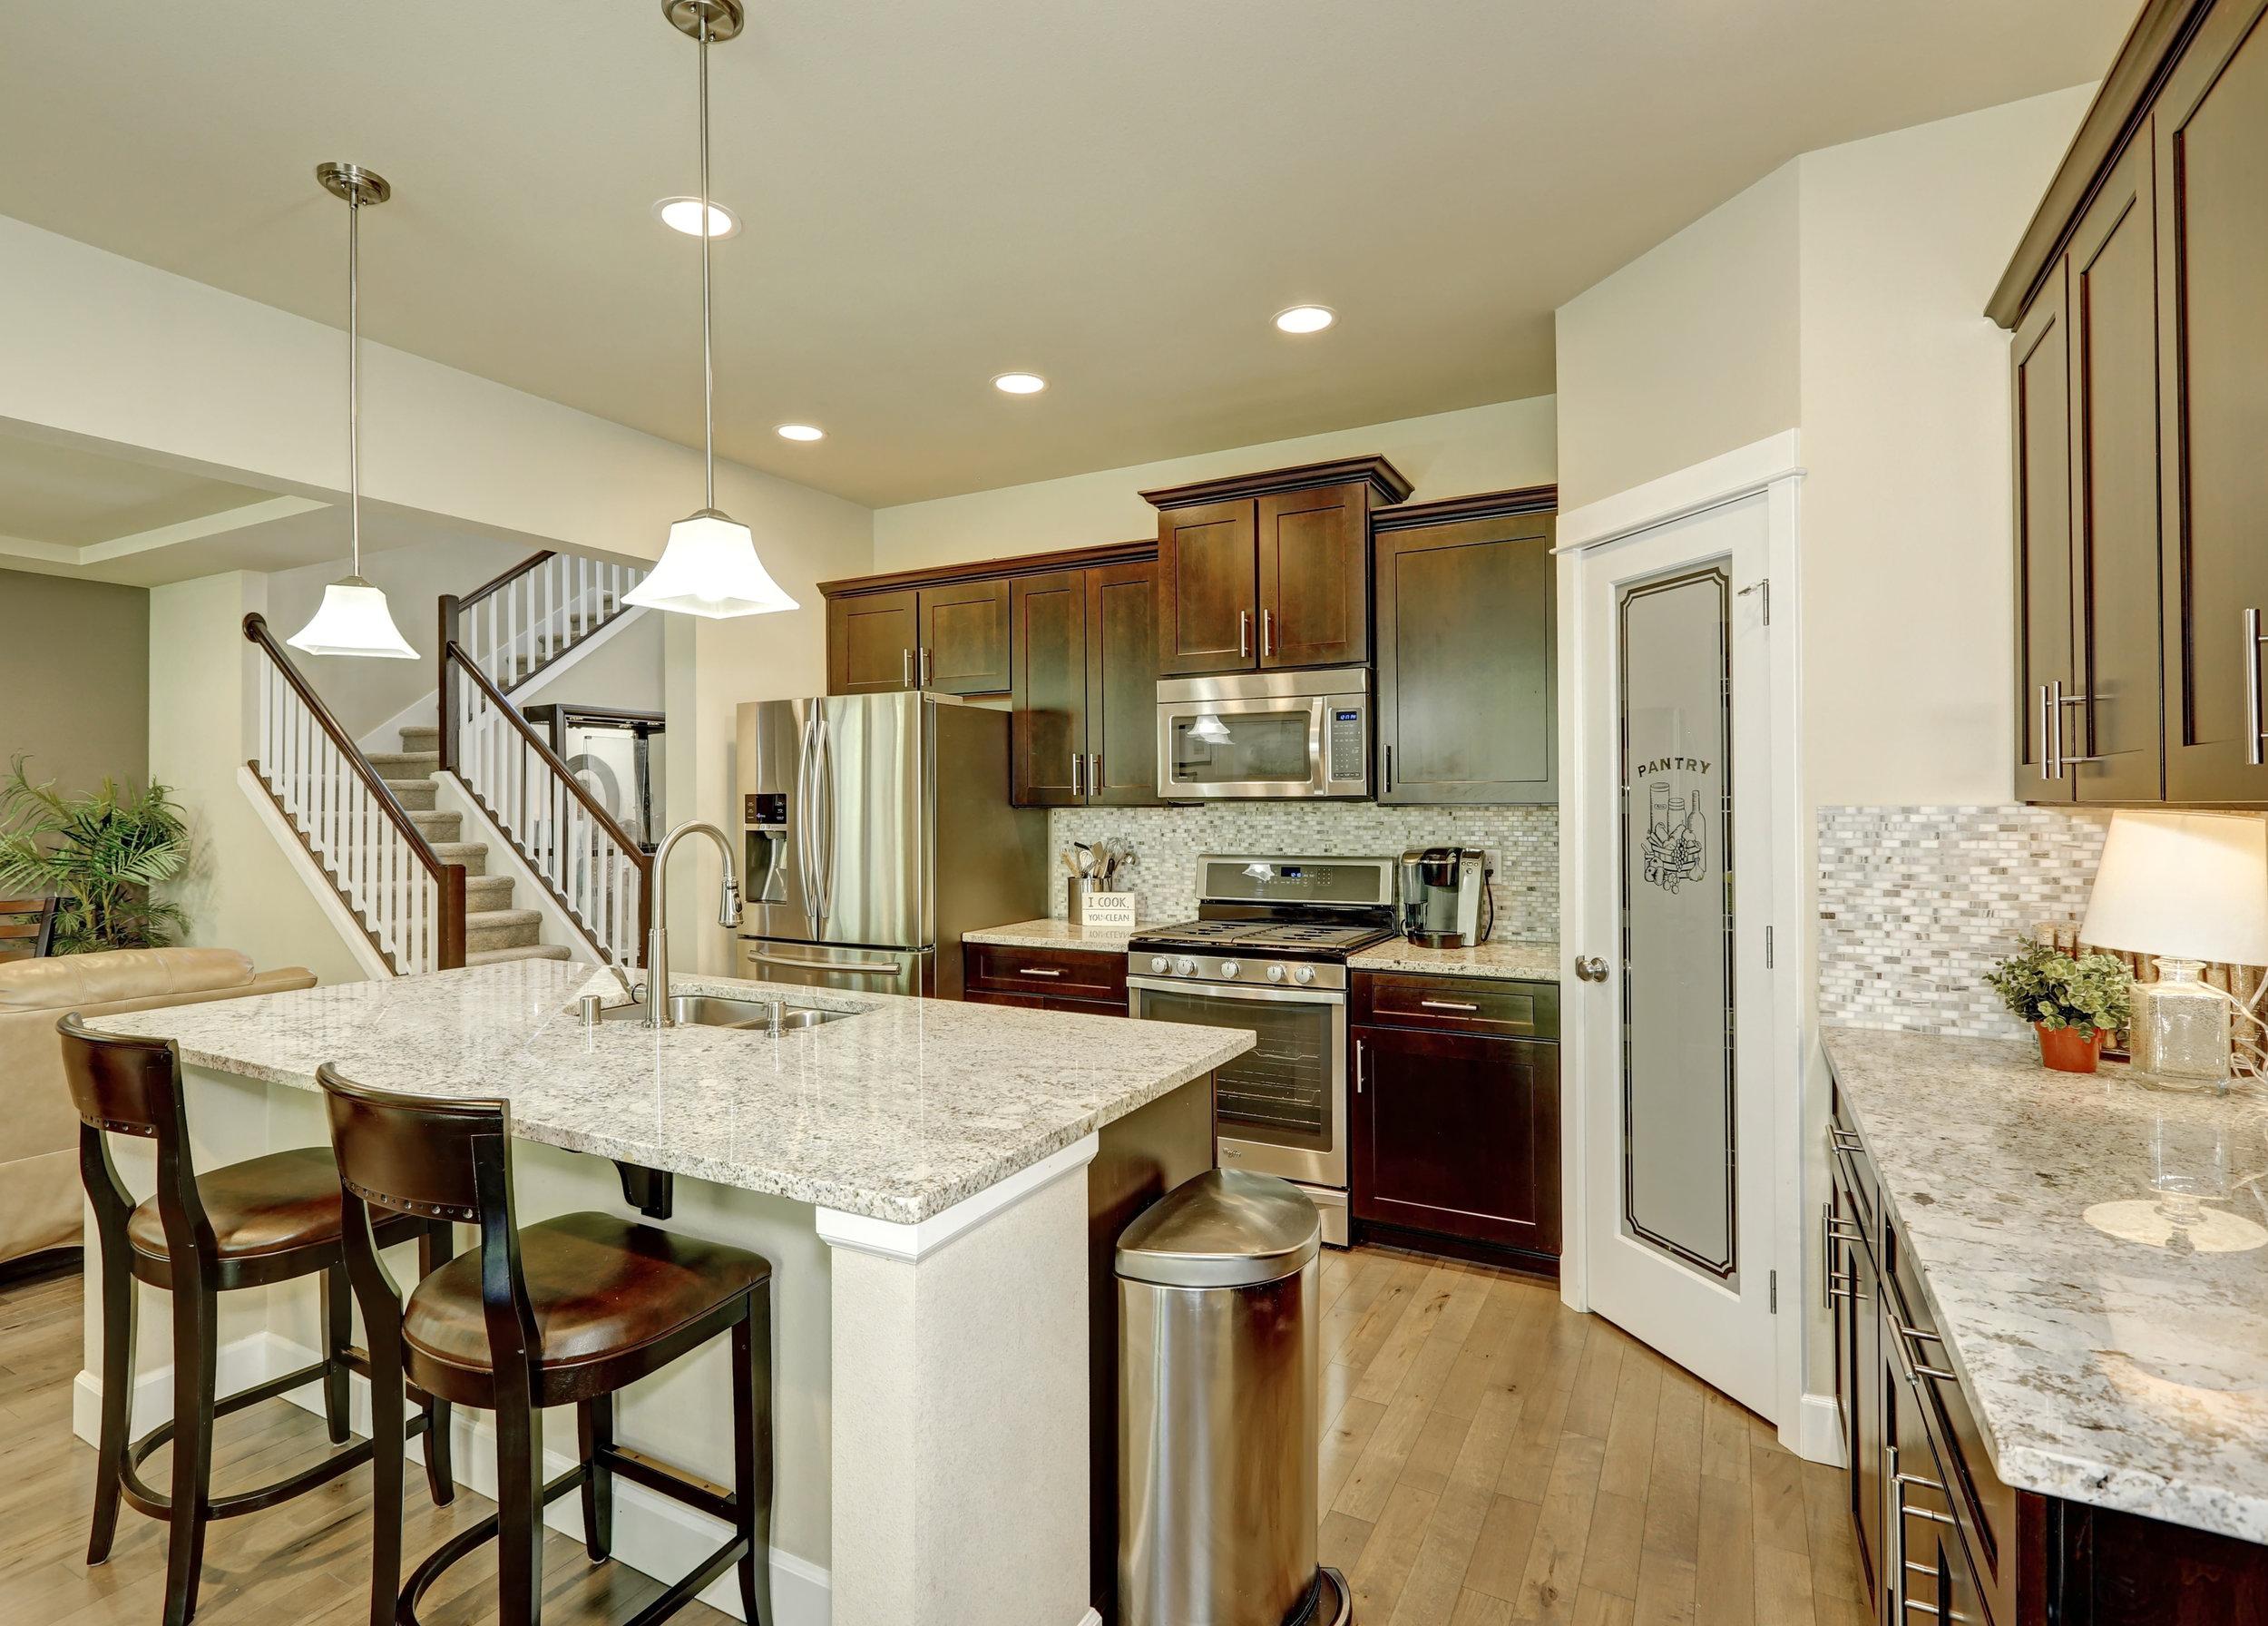 bigstock-Classic-Kitchen-Room-Interior--152875712.jpg